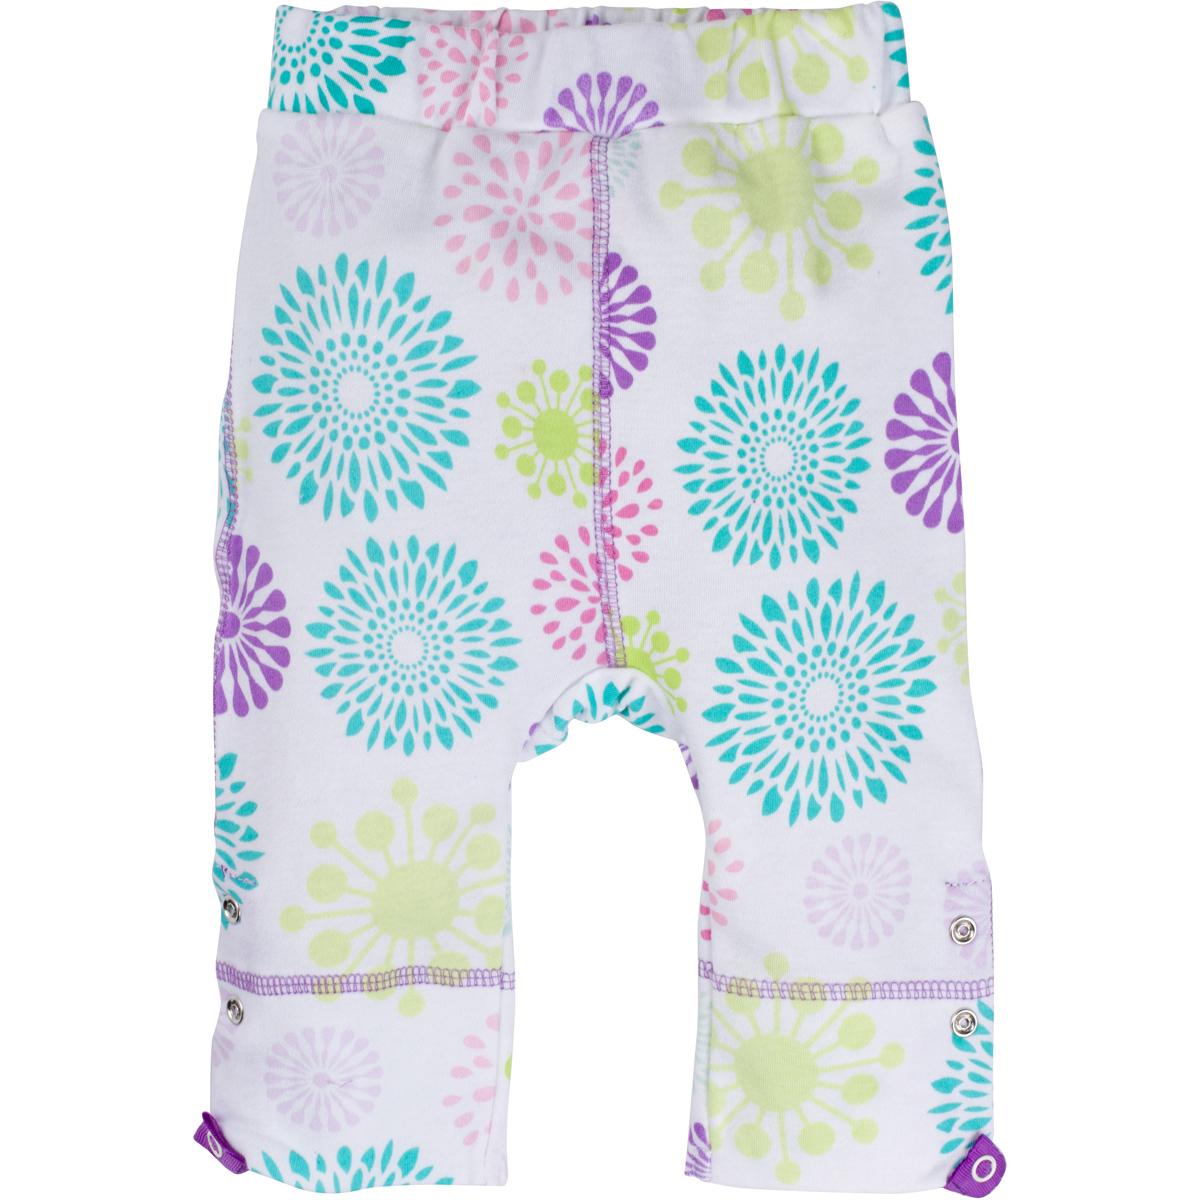 Colorful Burst Adjustable Pants